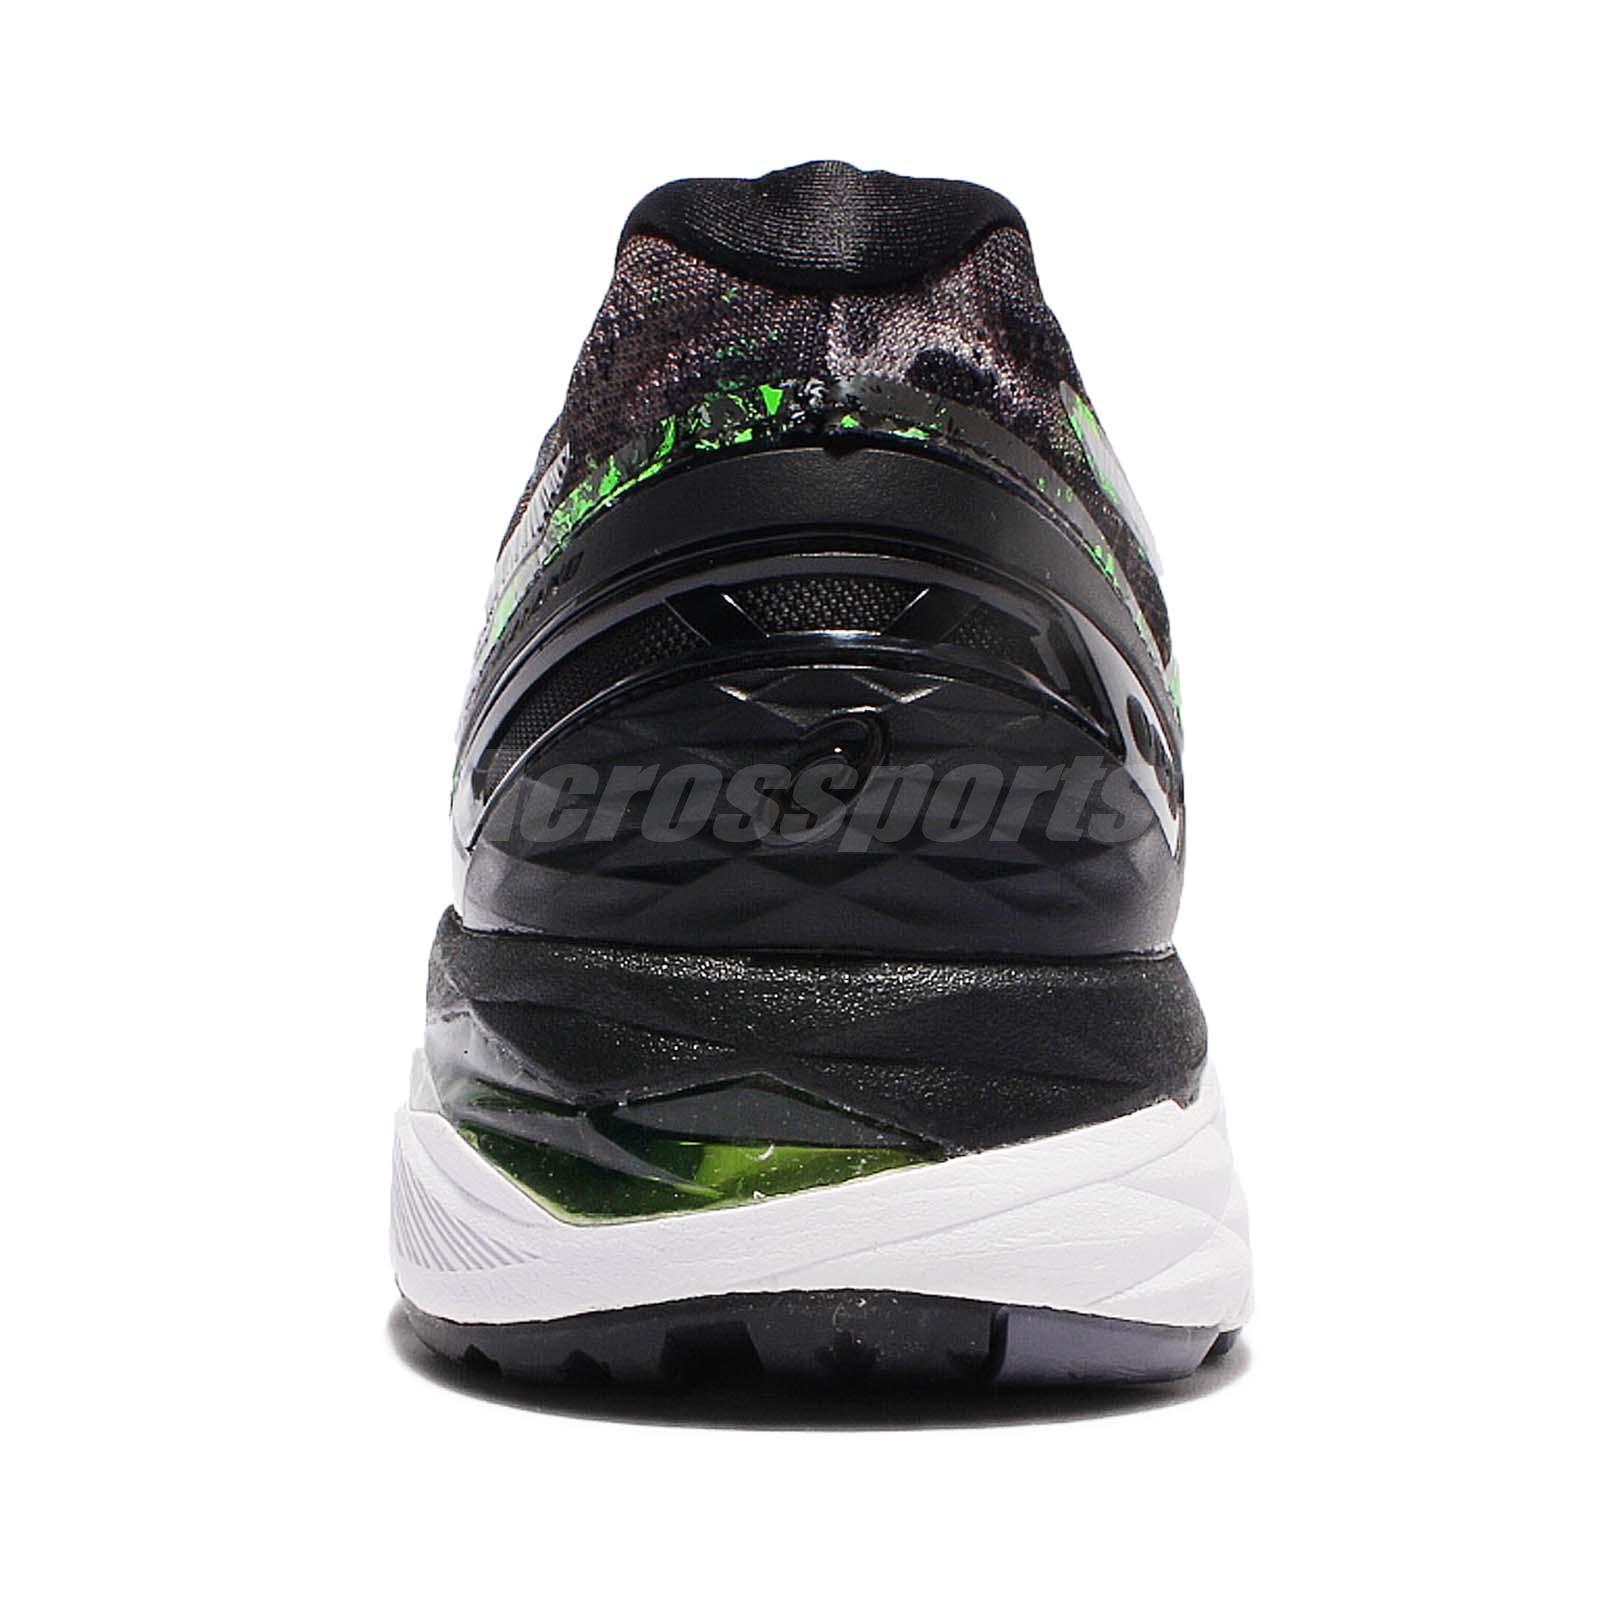 e5c6d9ba4d2c Asics Gel-Kayano 23 Black Green Silver Men Running Shoes Sneakers ...